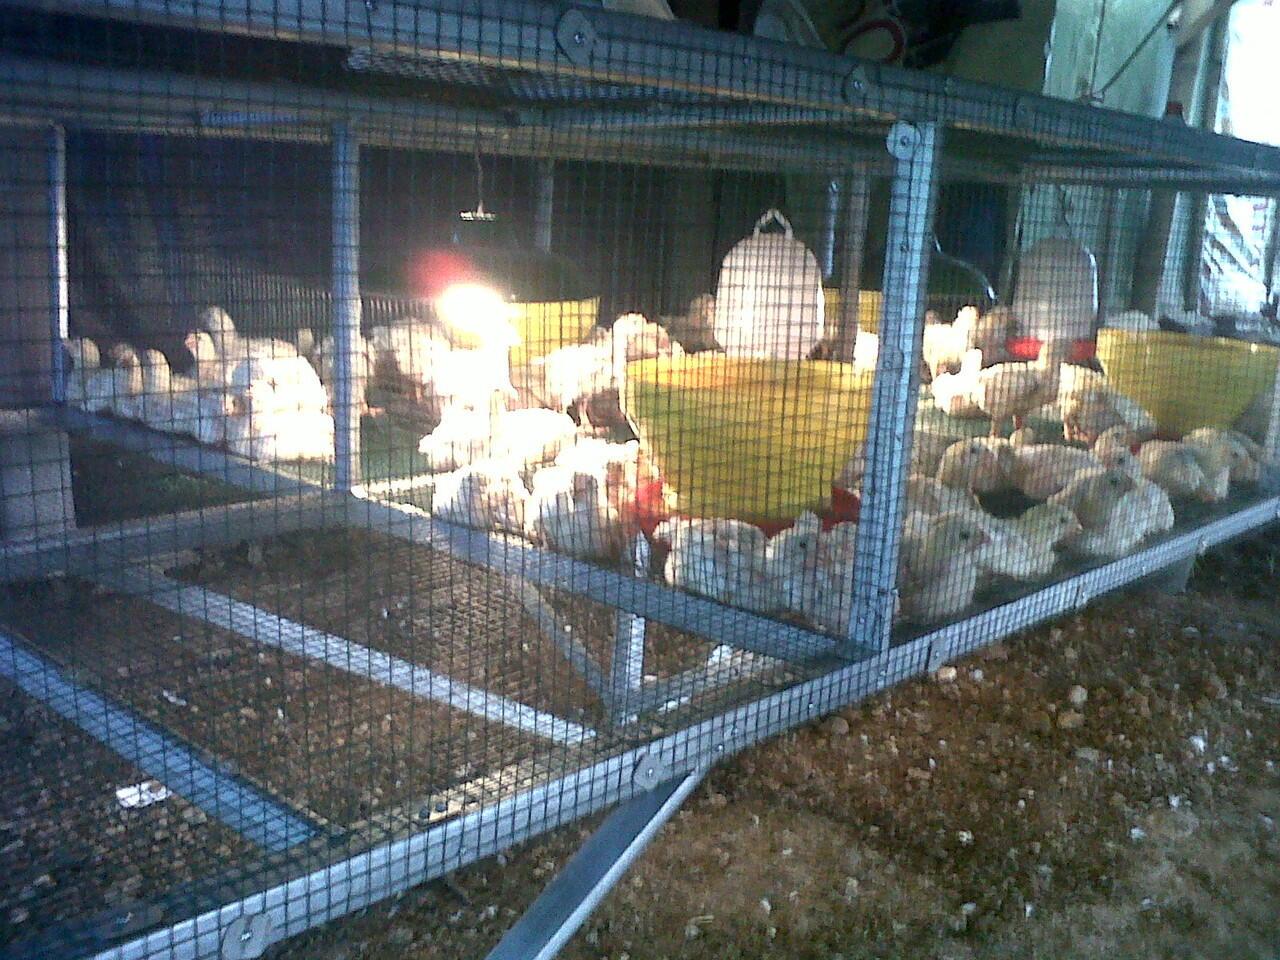 Ukuran Kandang Ayam Untuk 100 Ekor - Berbagai Ukuran